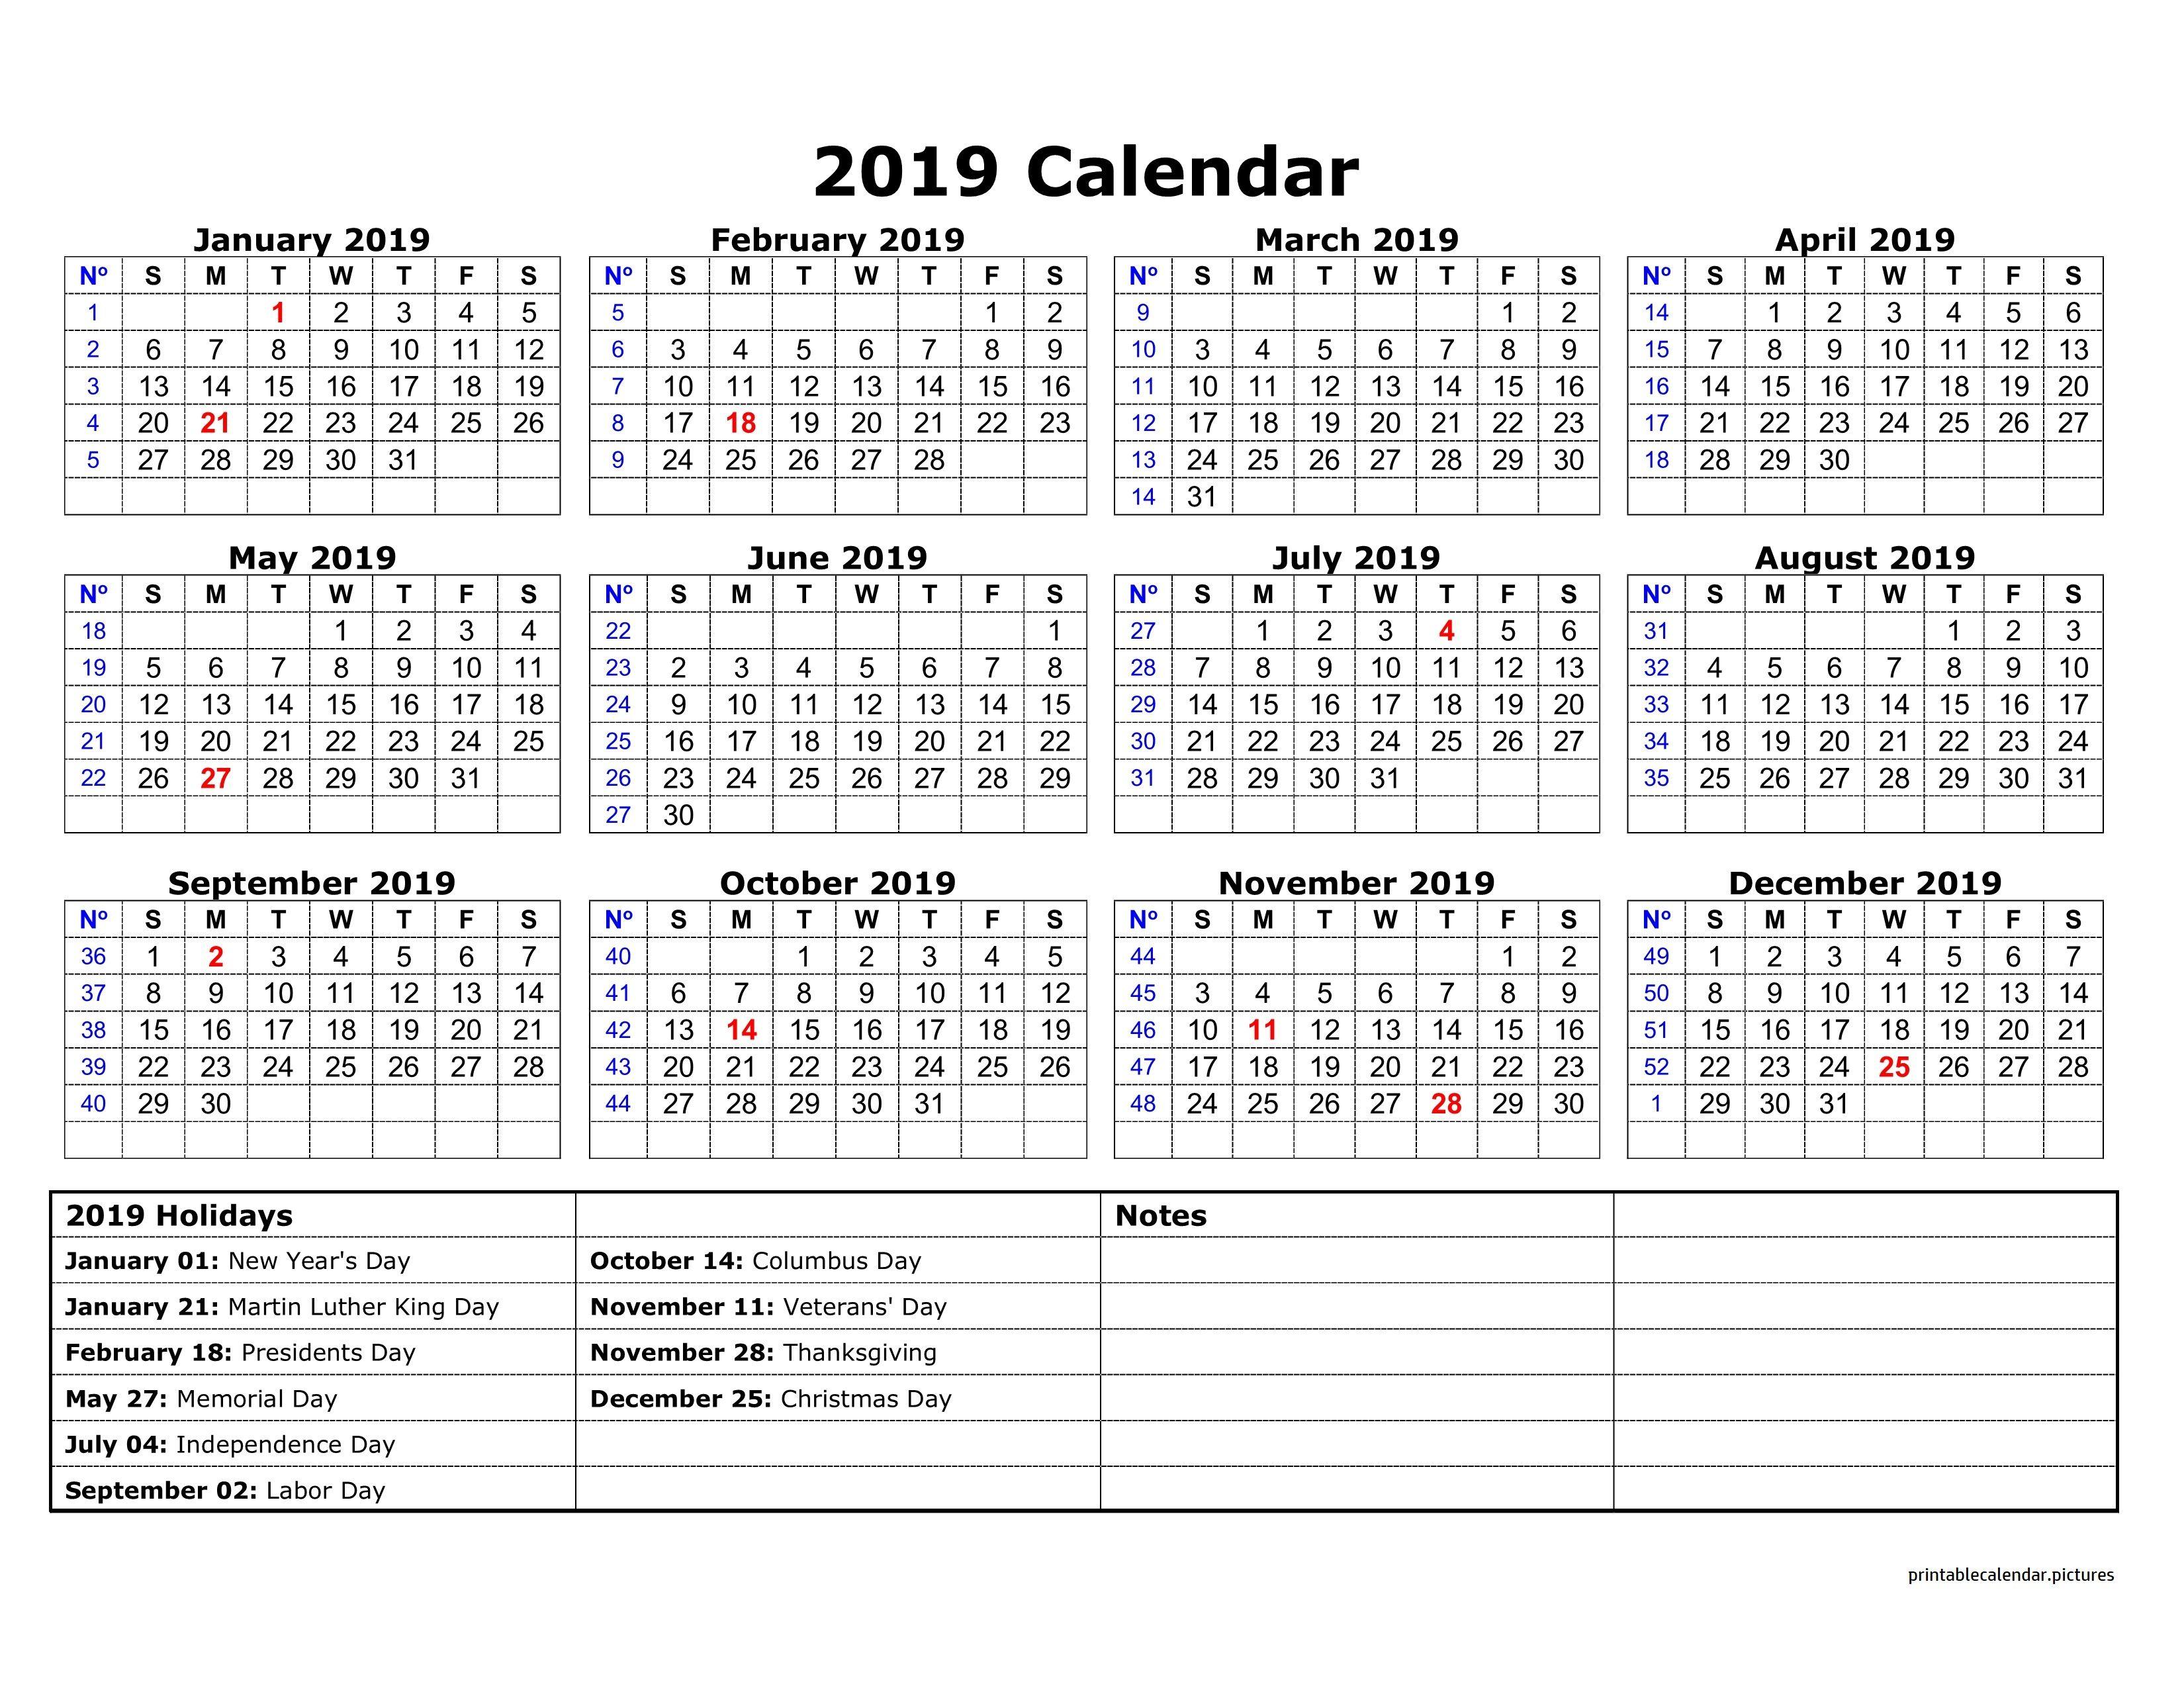 2019 Calendar Holidays Australia | 2019 Calendar Holidays